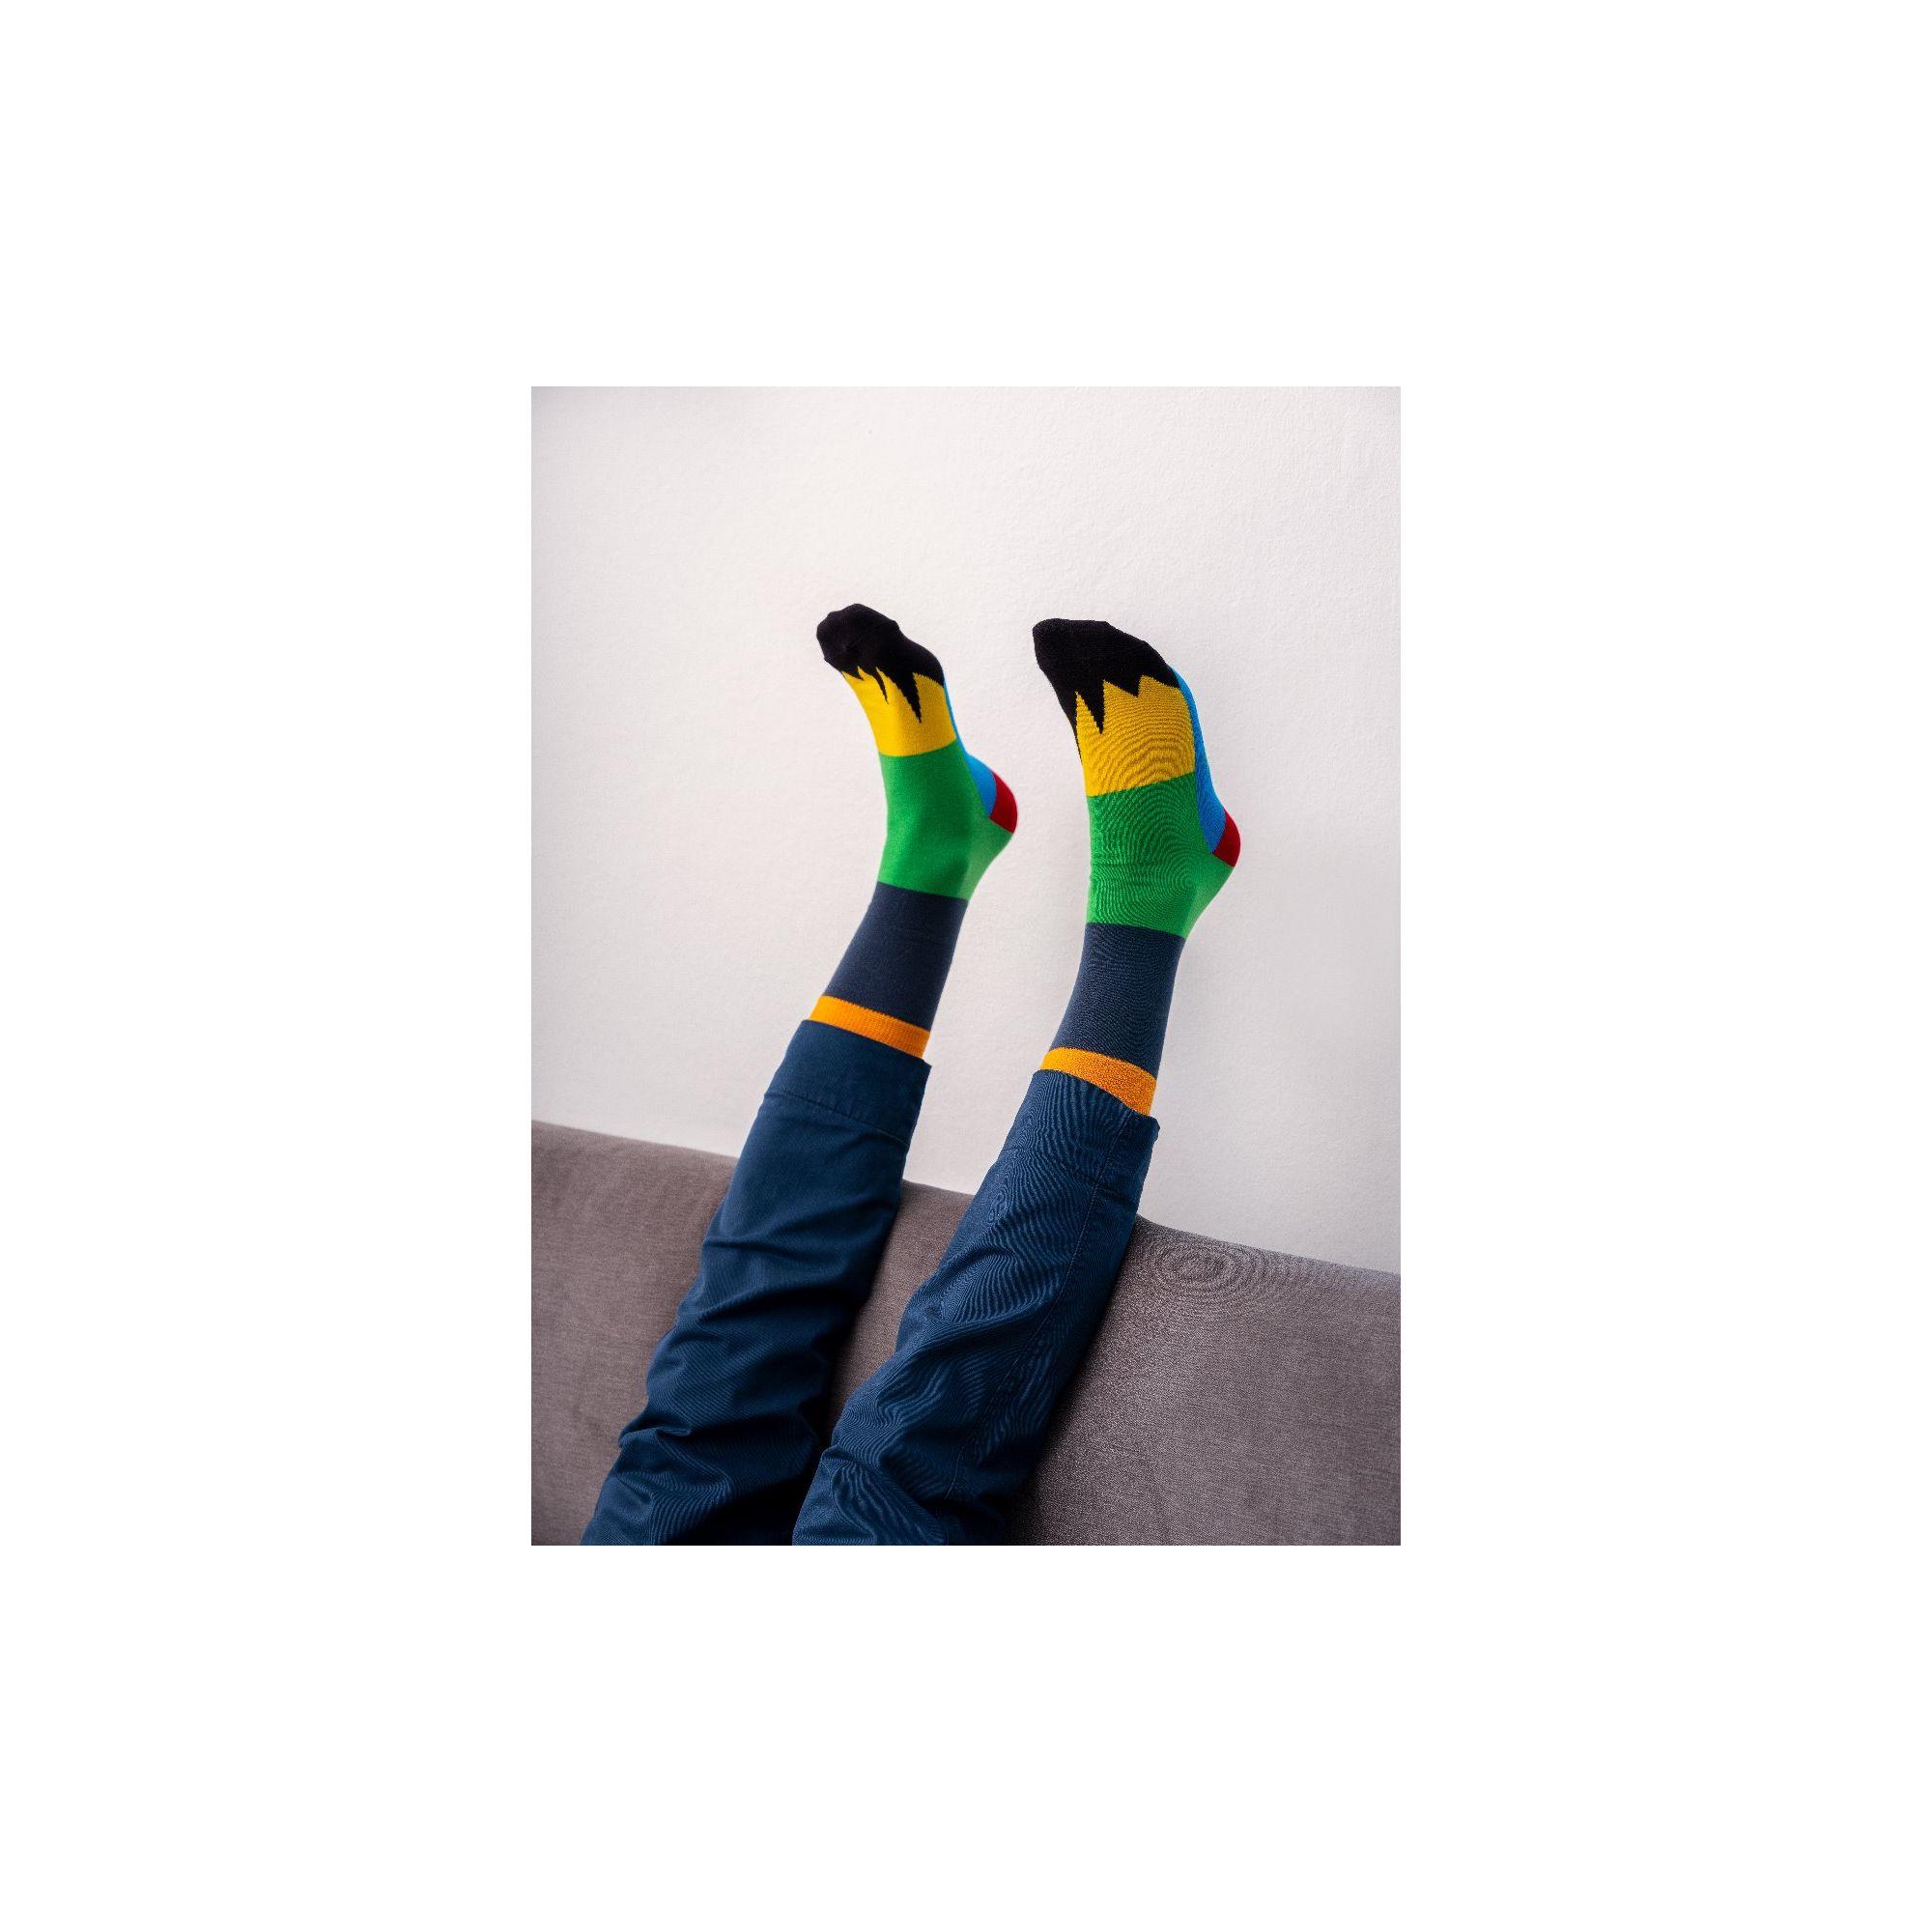 PATCHWORK SOCKS NAVY BLUE/EMERALD GREEN